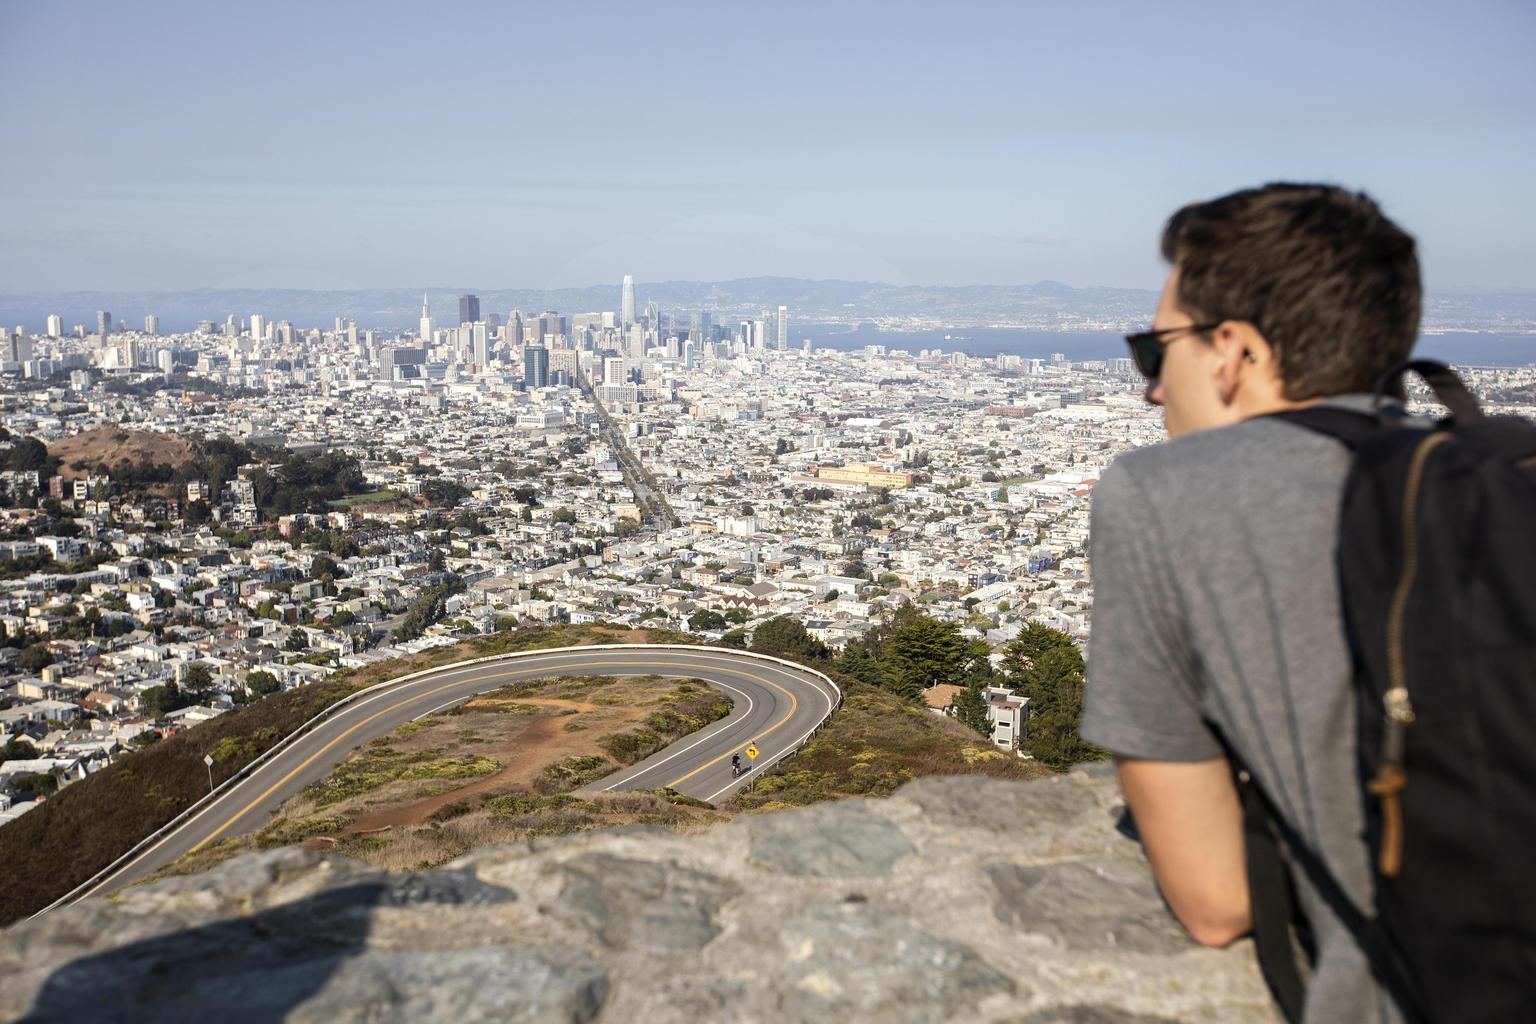 MÁS FOTOS, Combo Tour: Alcatraz Island and San Francisco Grand City Tour